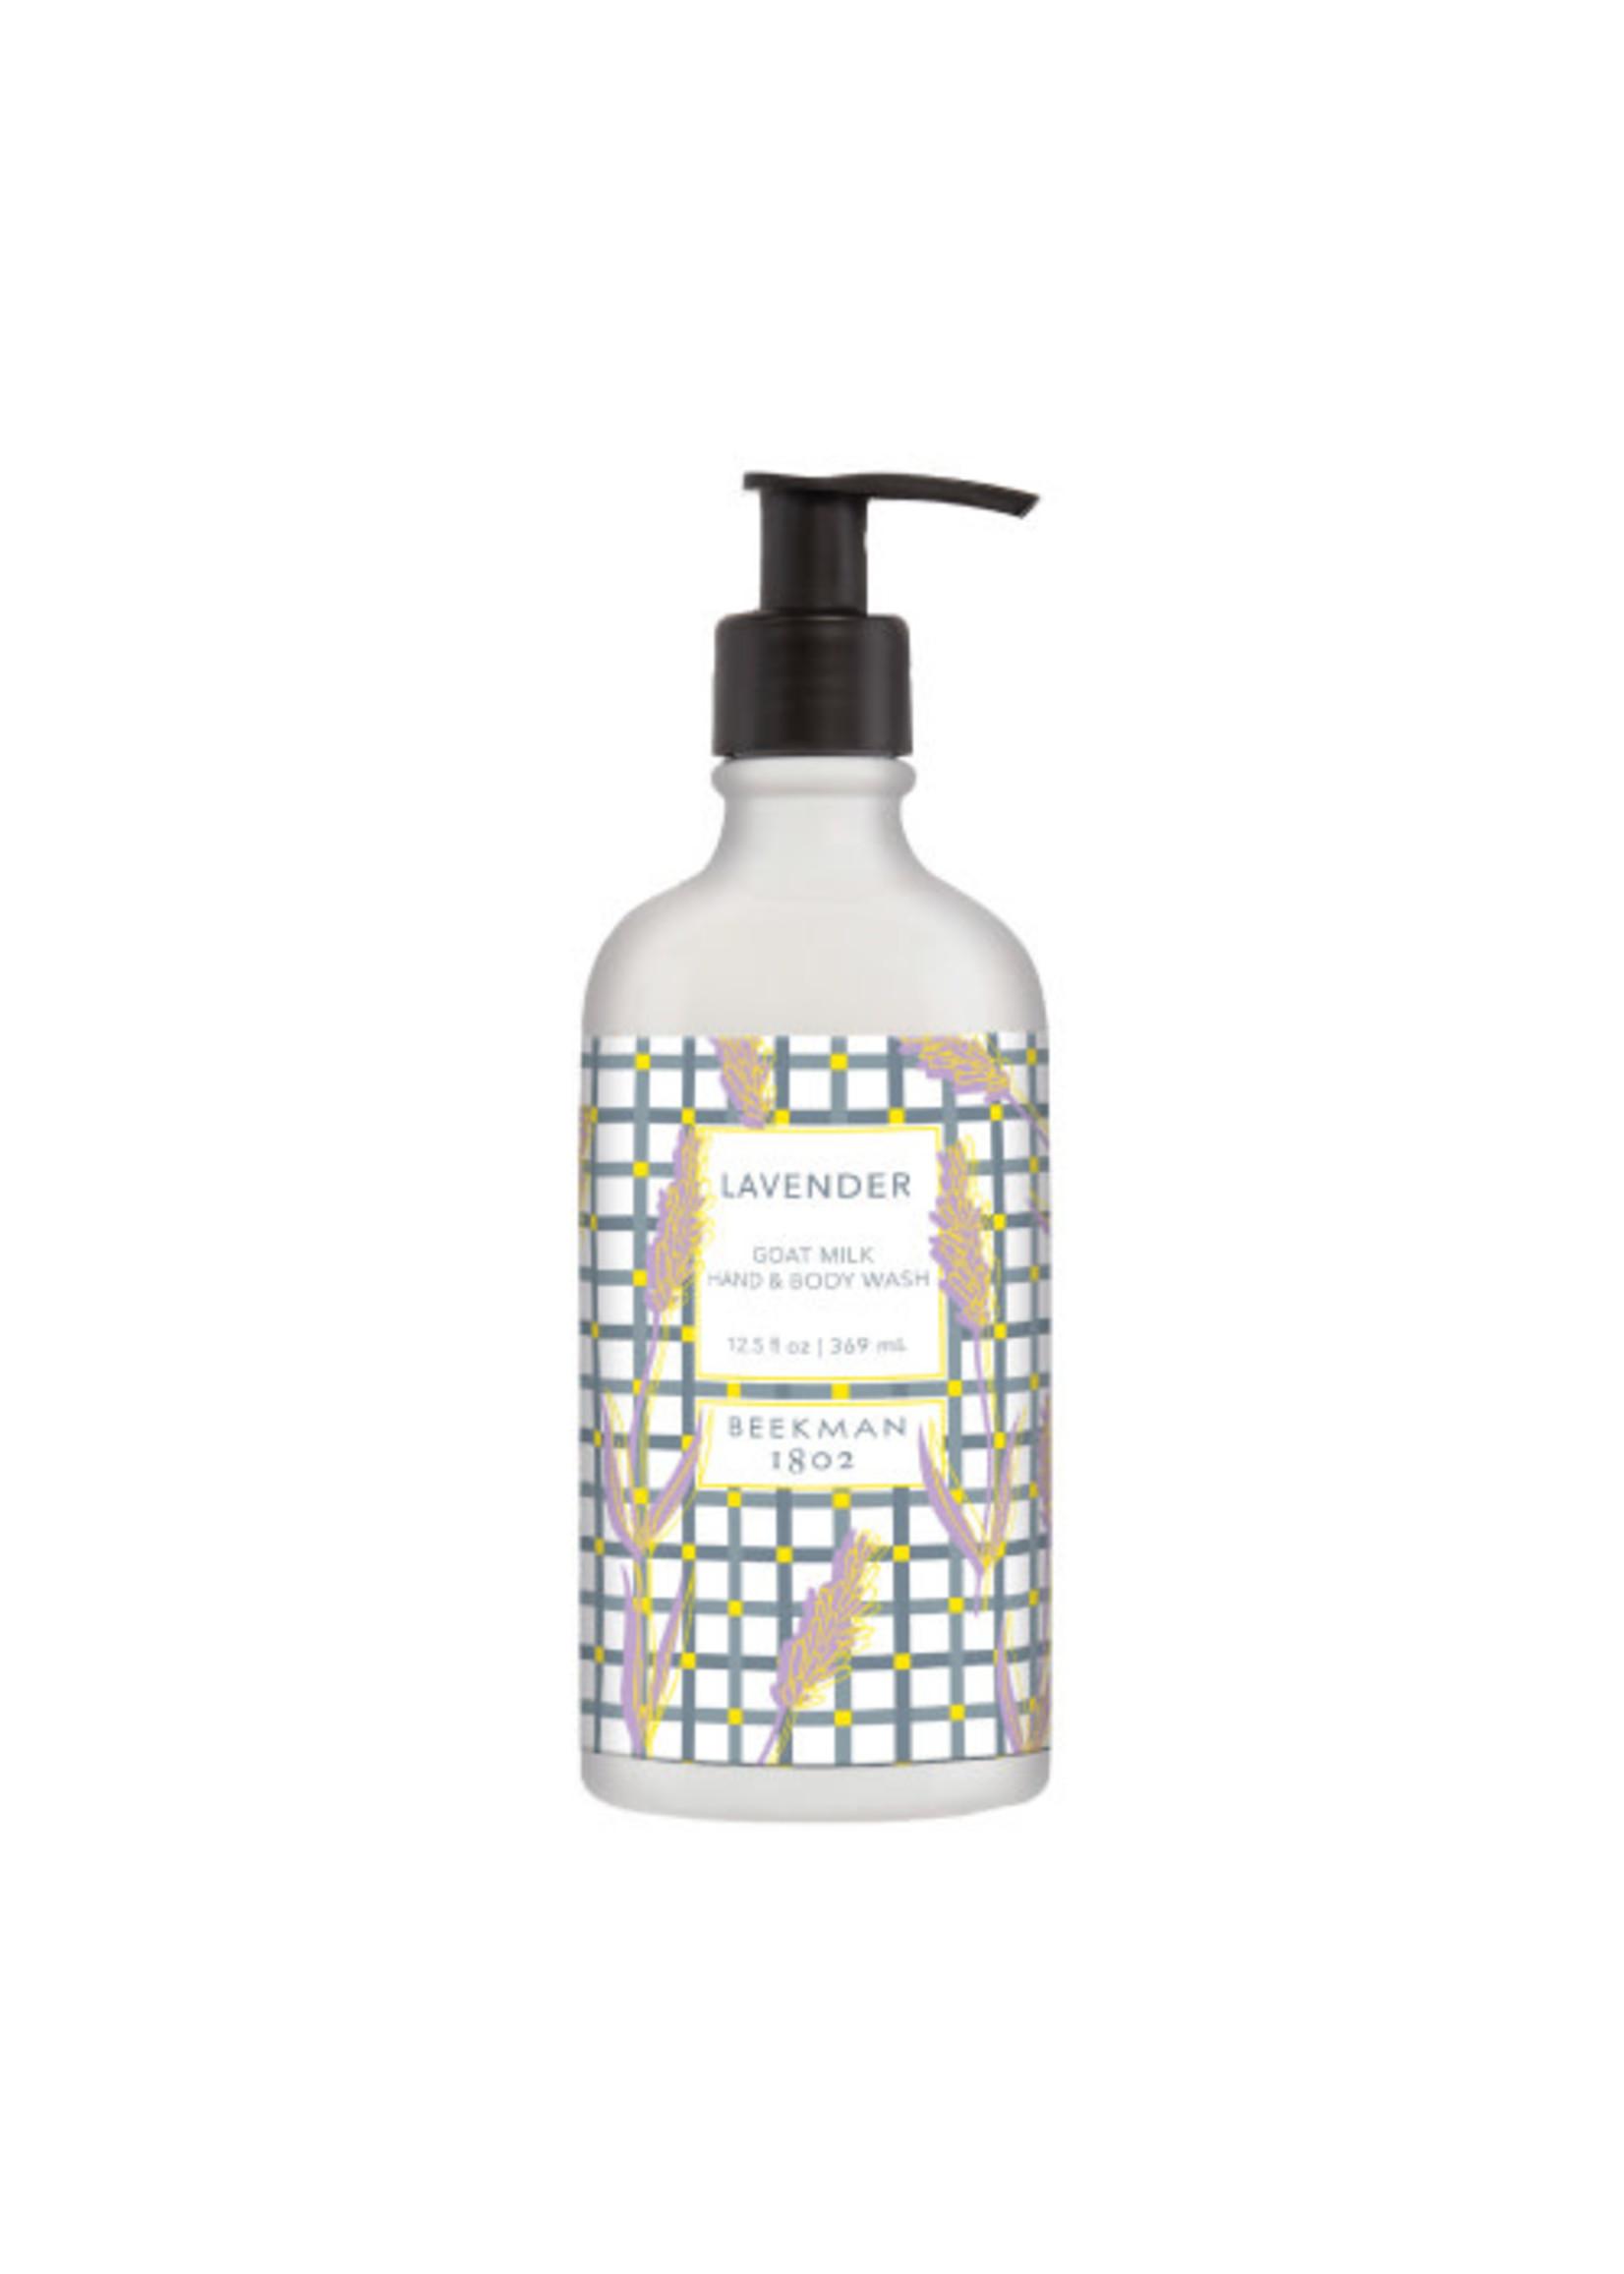 Beekman 1802 Lavender Hand & Body Wash